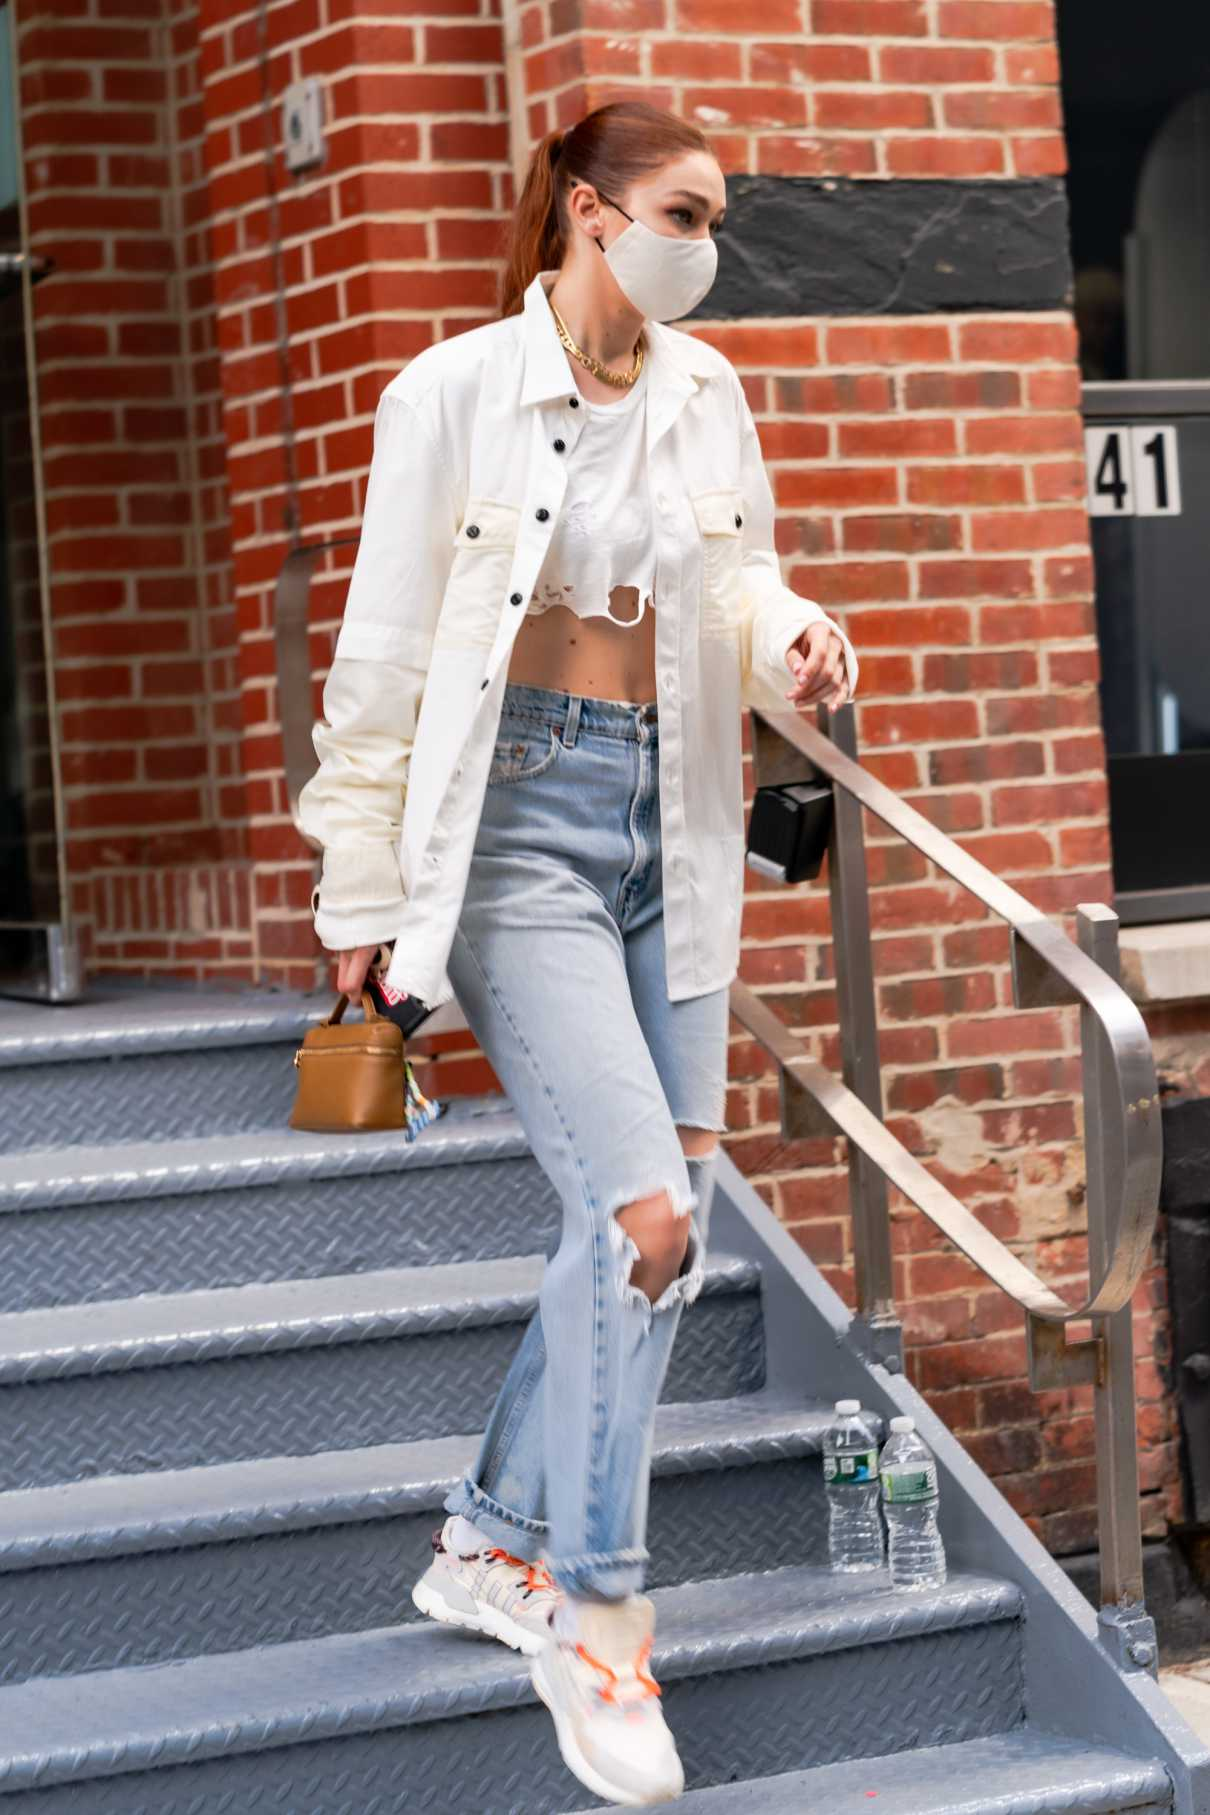 Gigi Hadid in a White Shirt